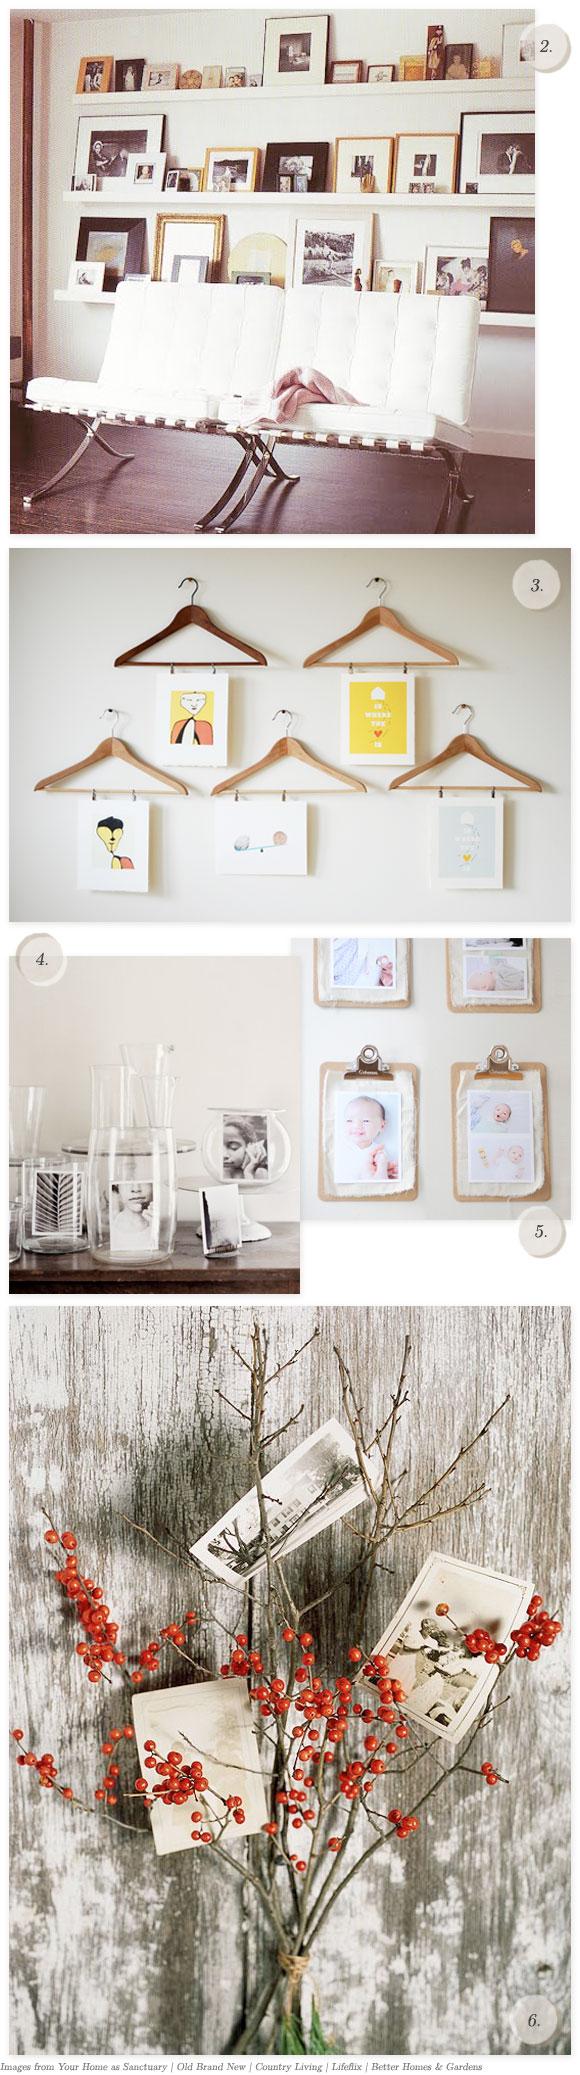 10 creative ways to display photos and art home creature